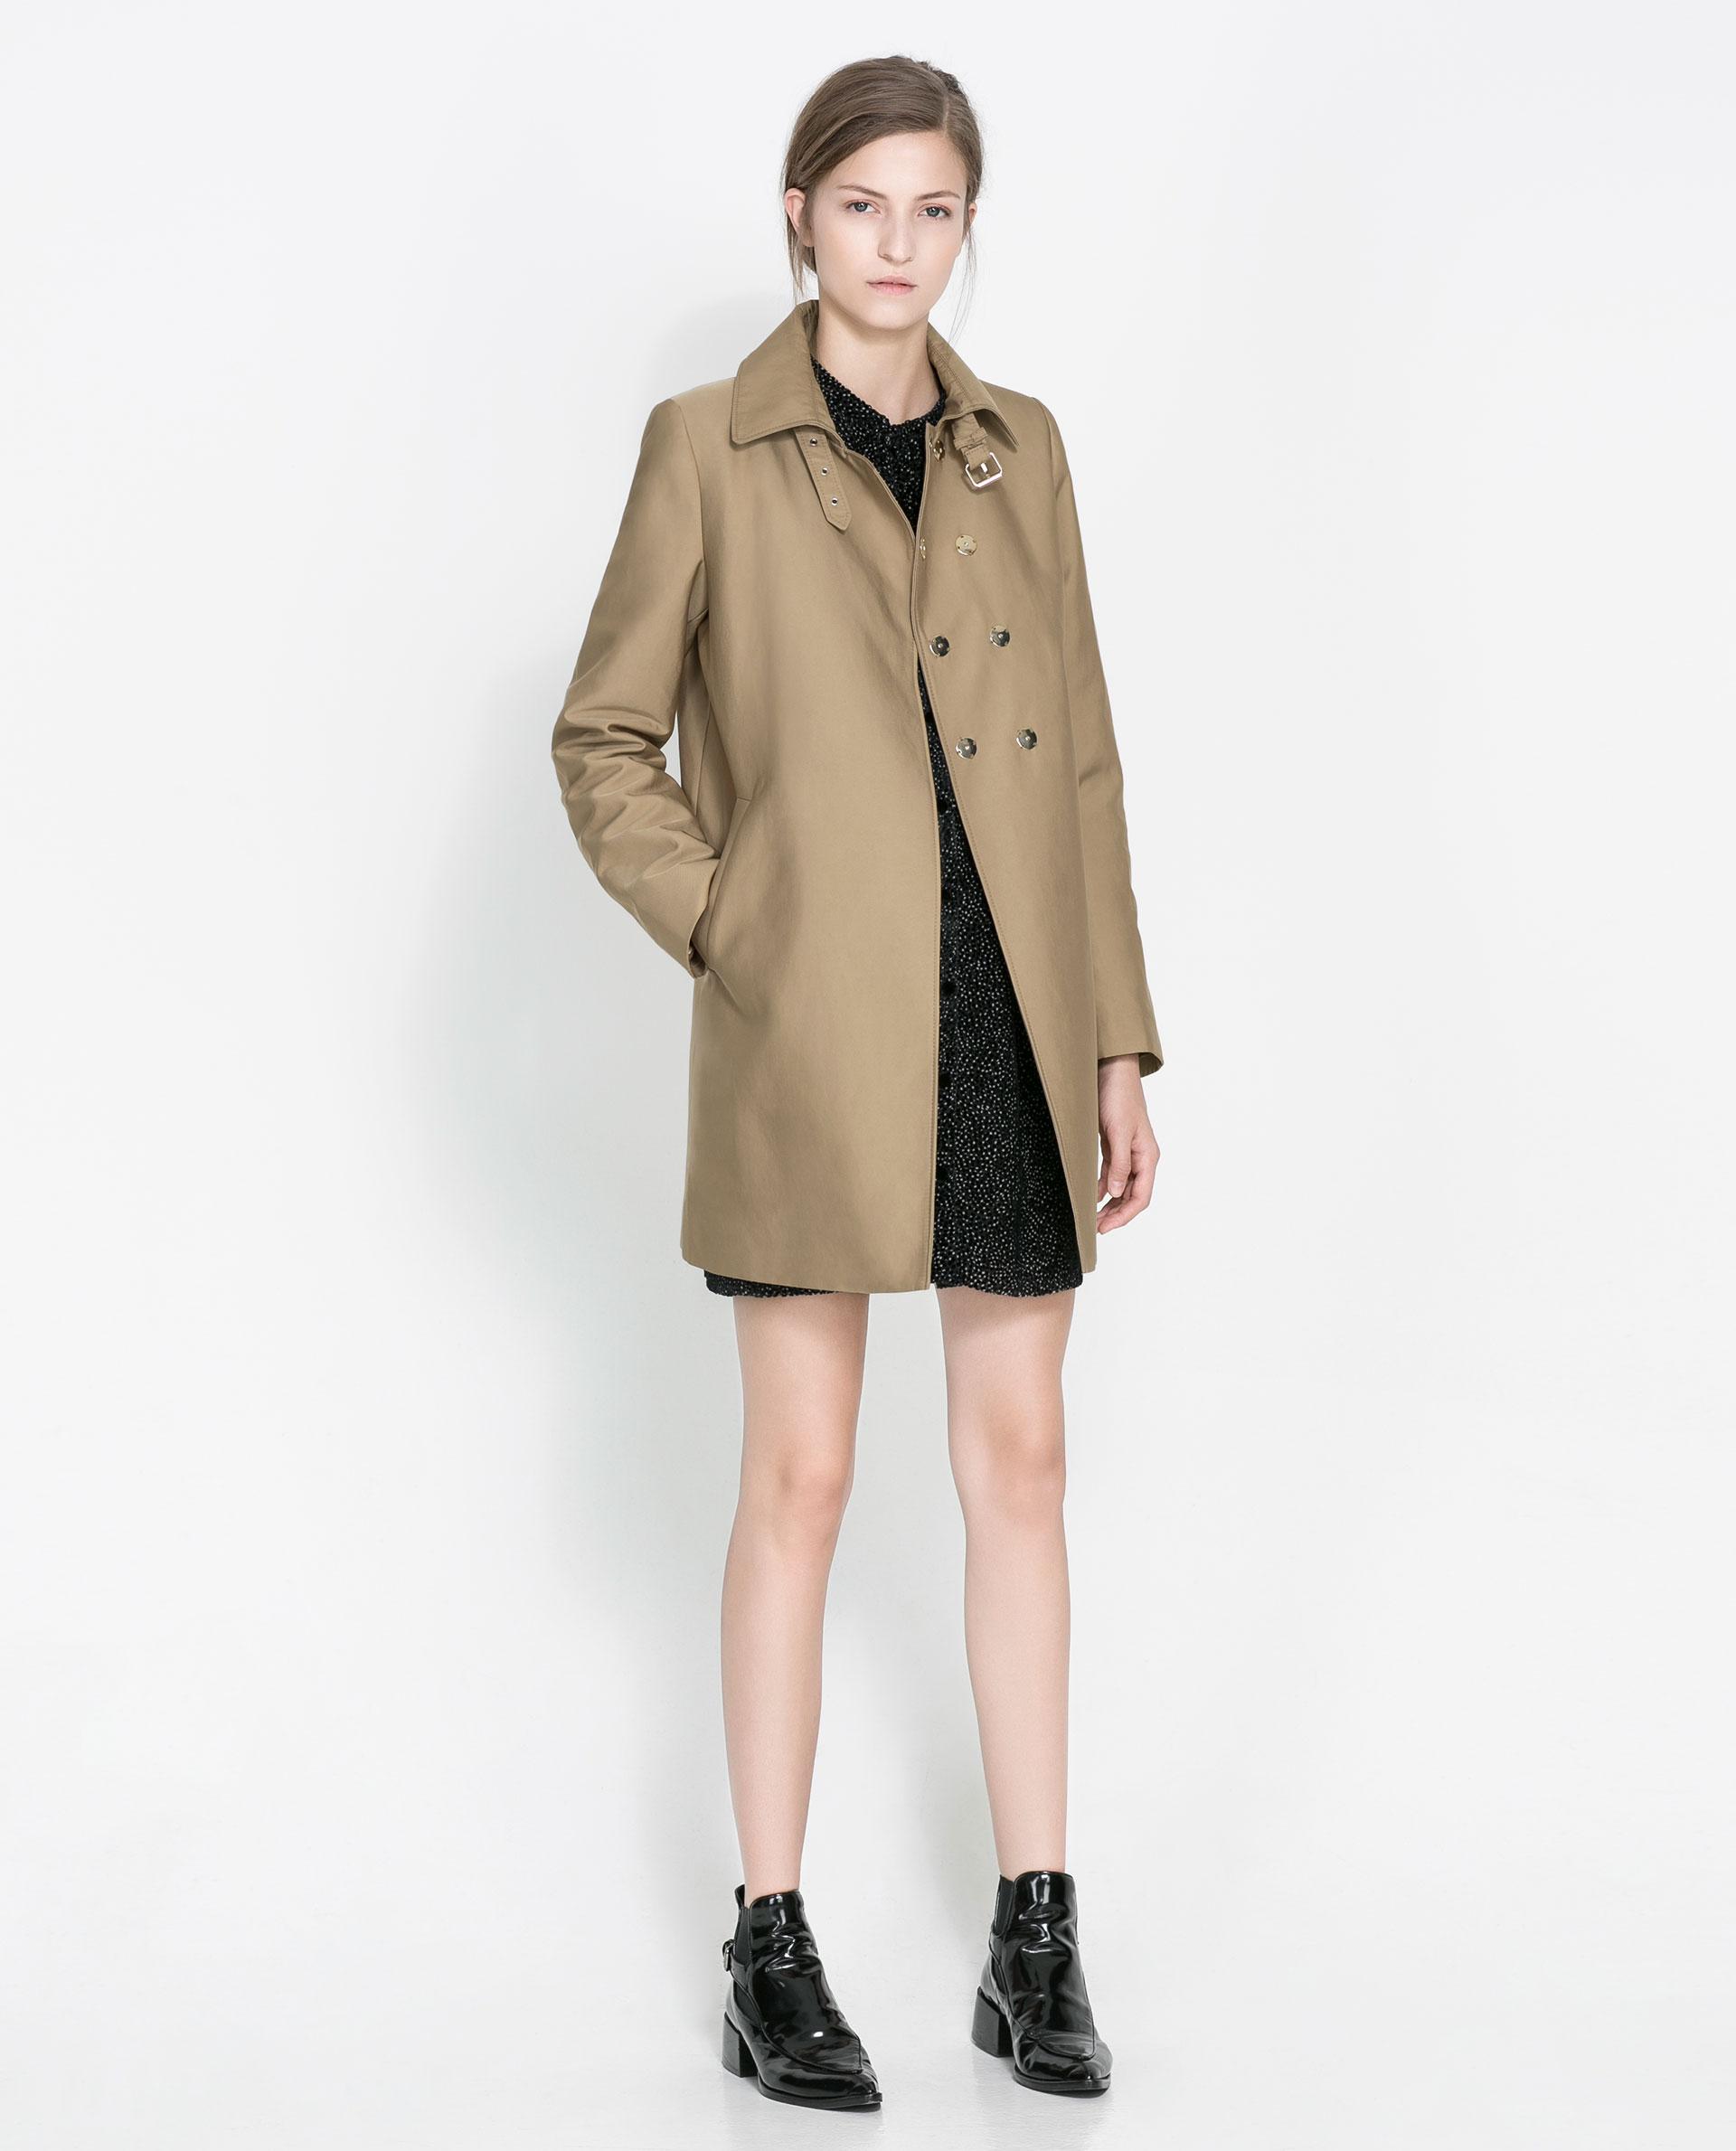 Zara Cotton Trench Coat In Brown Lyst